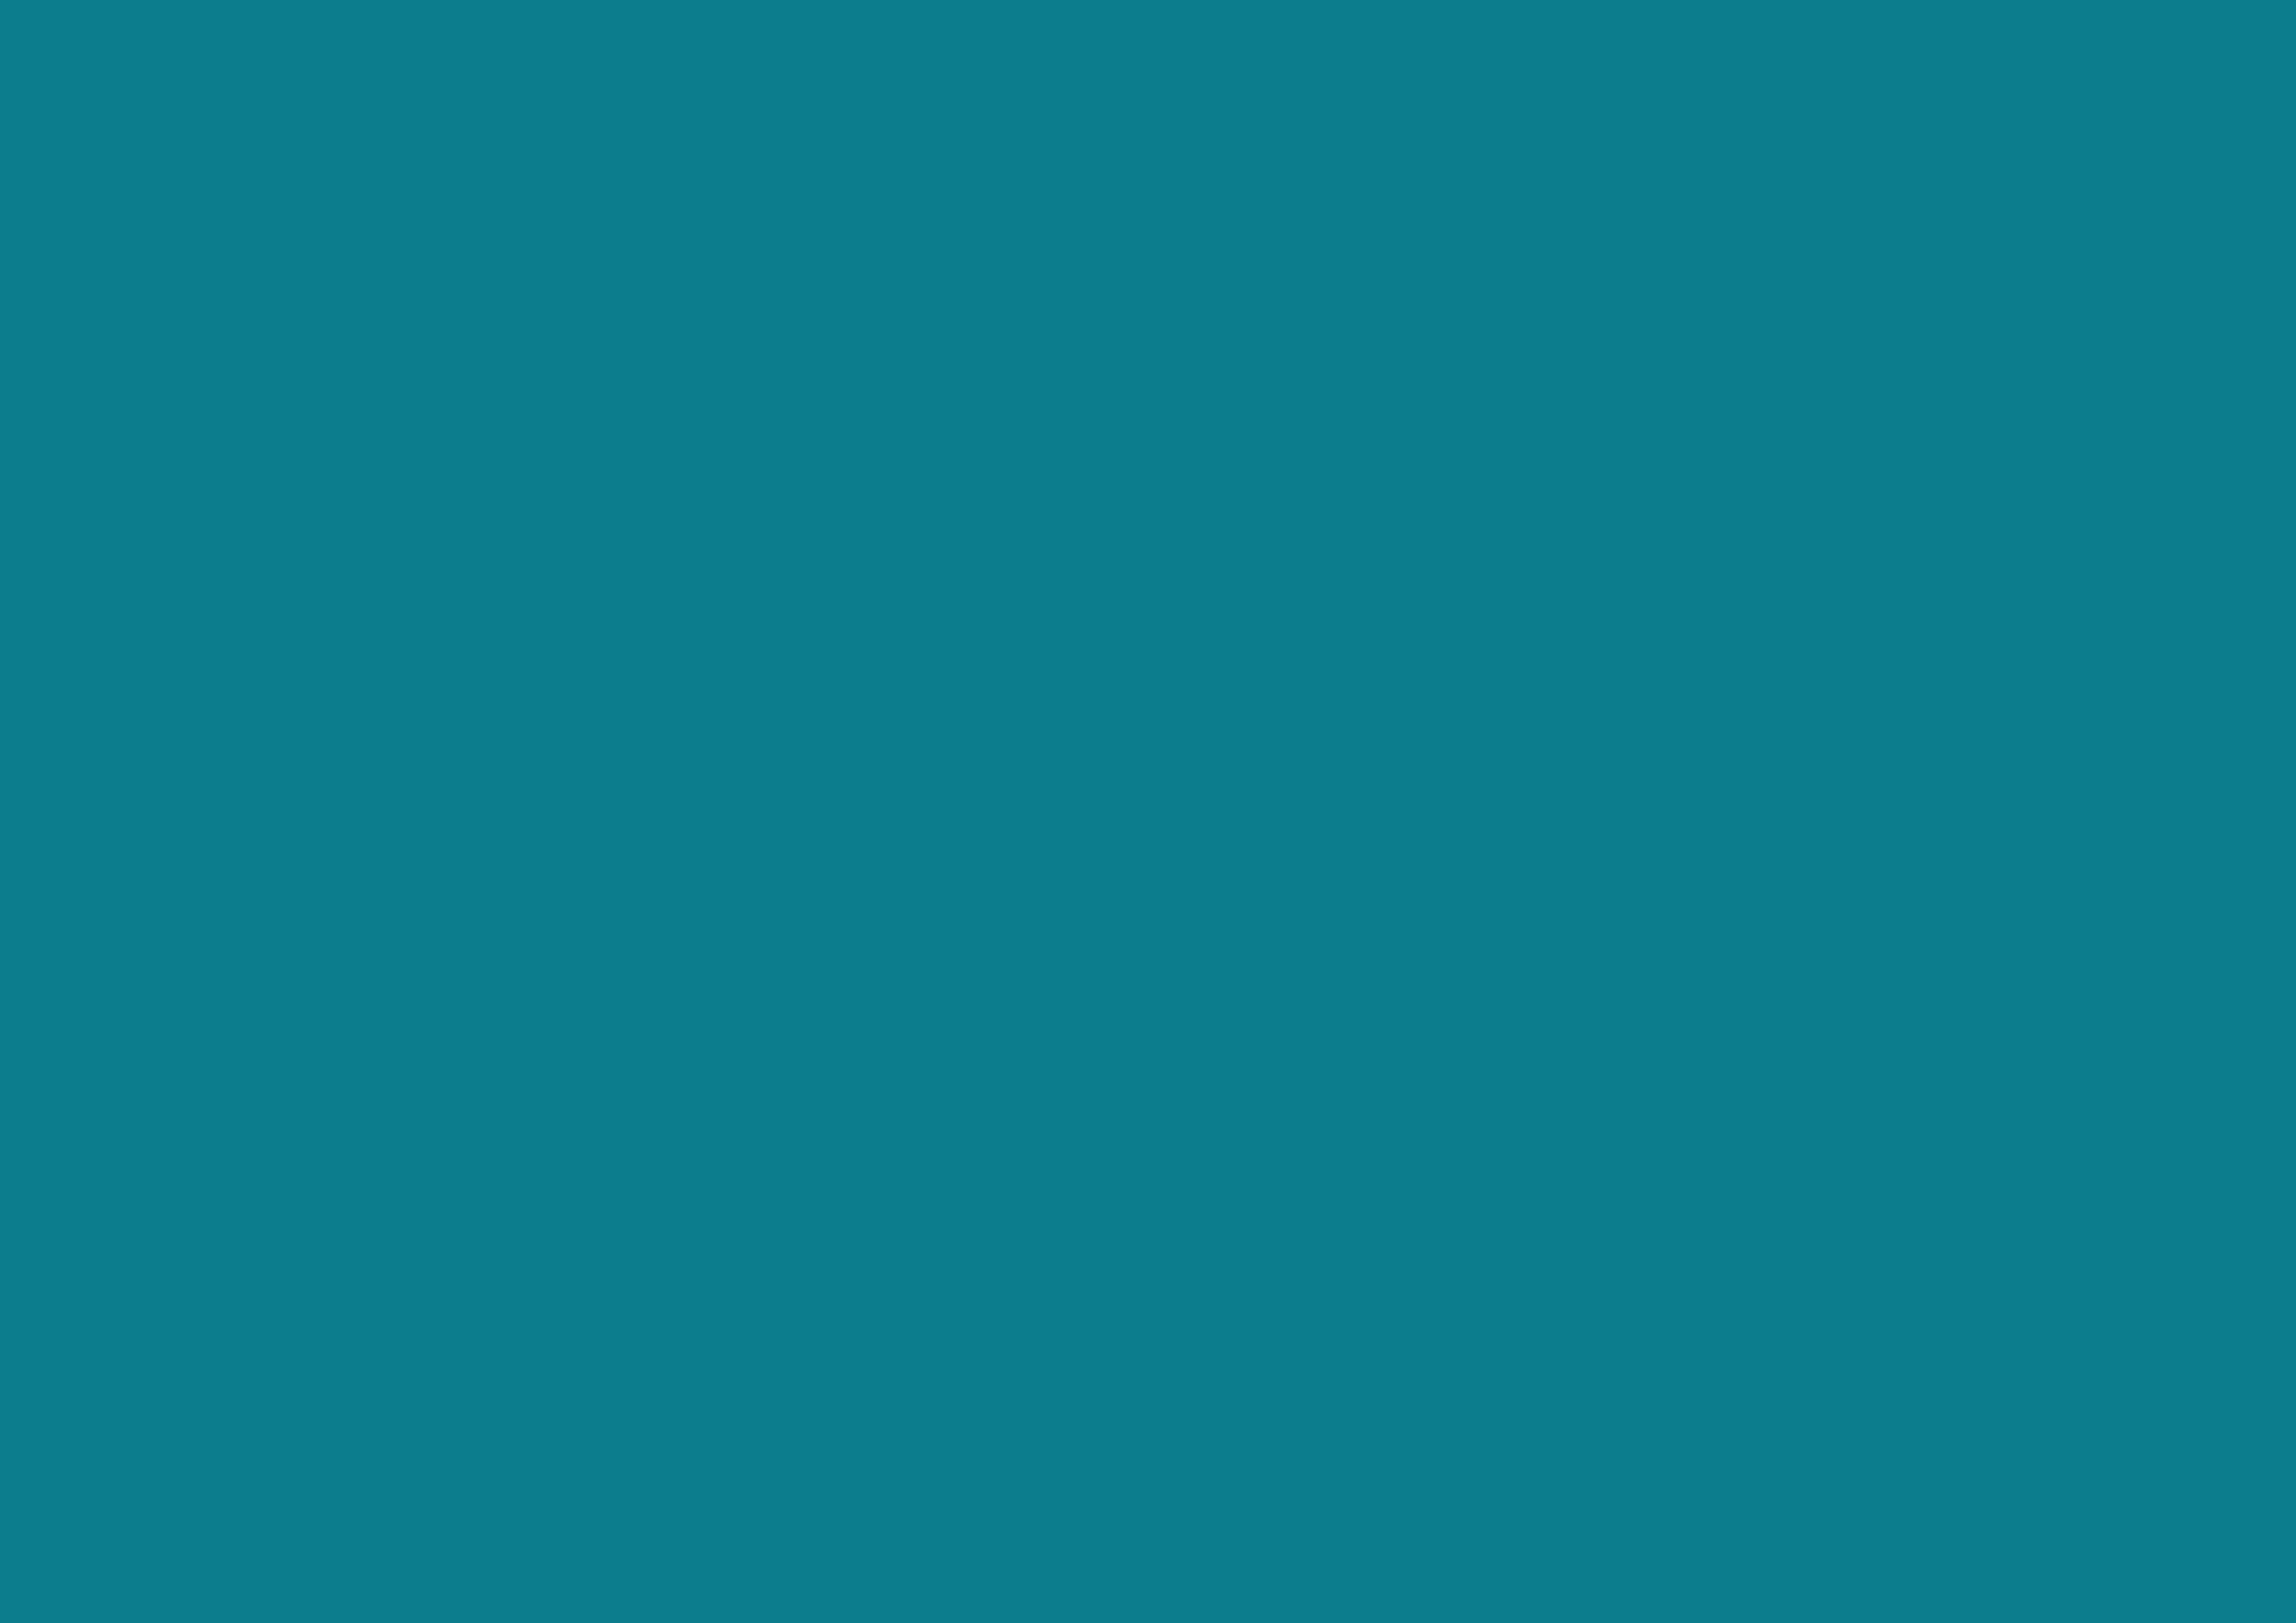 3508x2480 Metallic Seaweed Solid Color Background